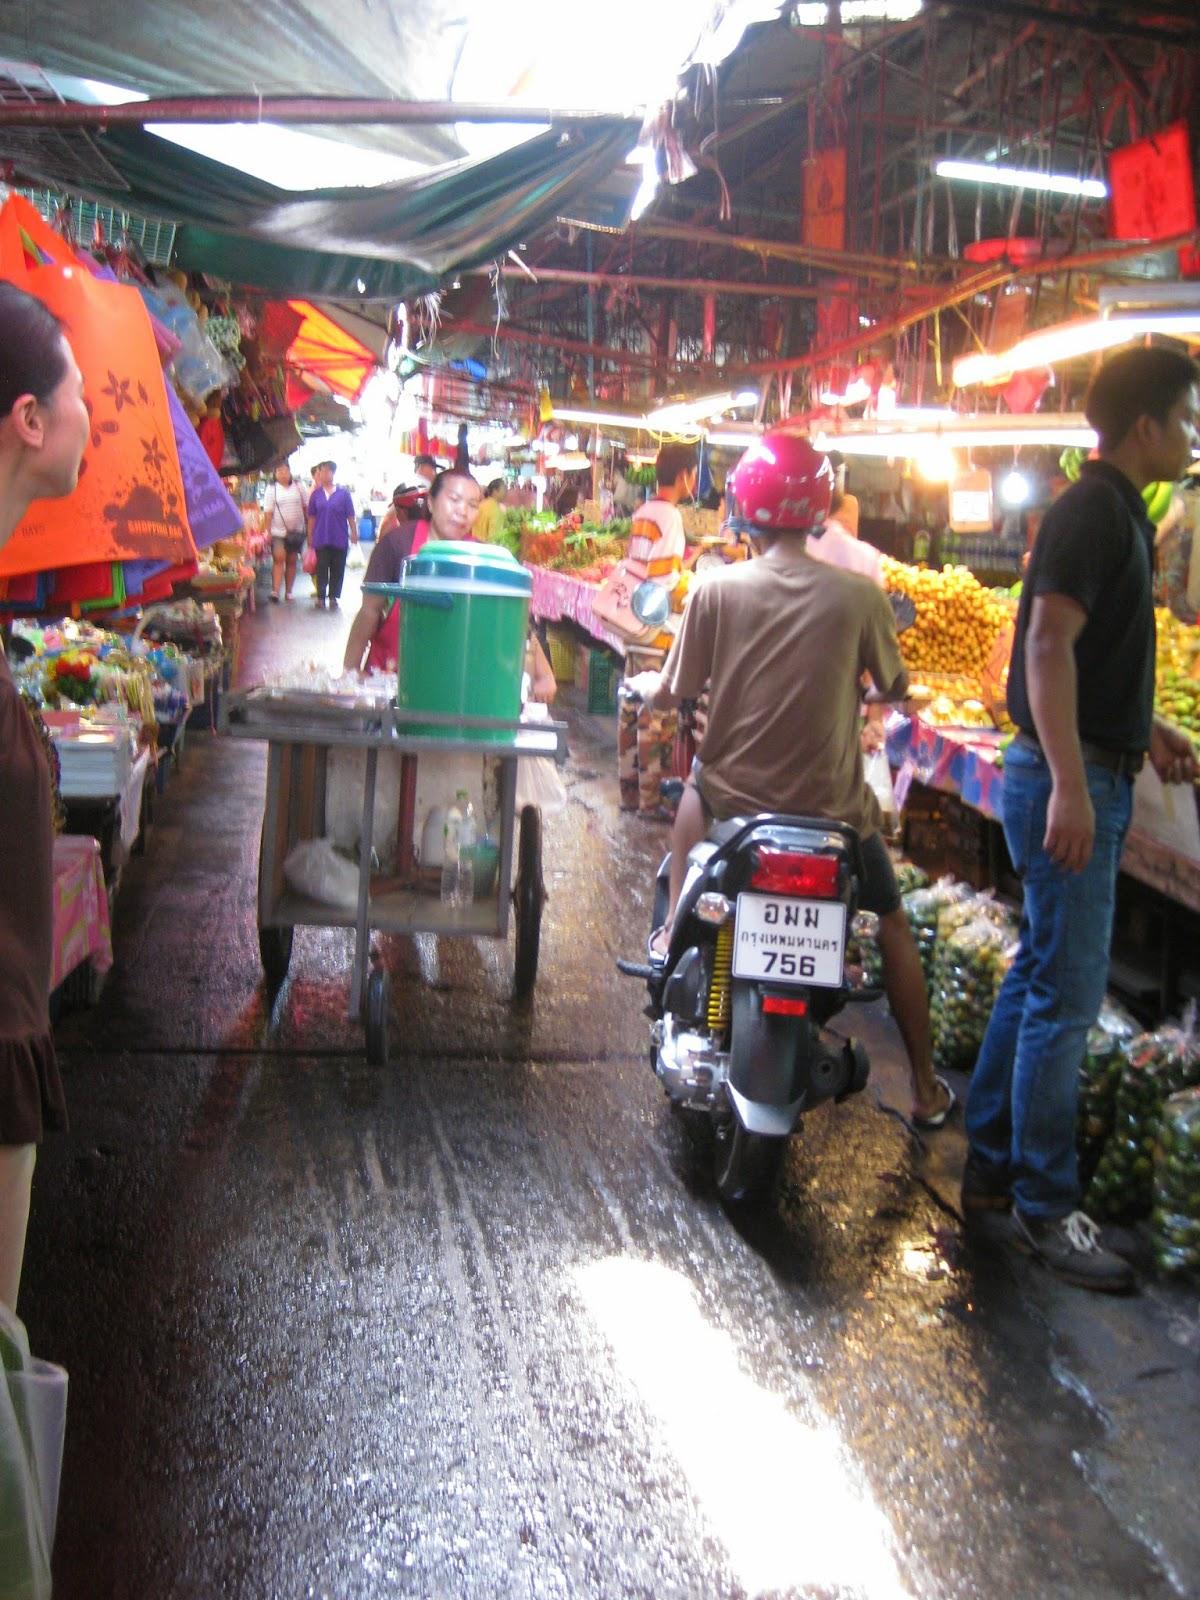 Bangkok - Wet market - people shop by motorbike!